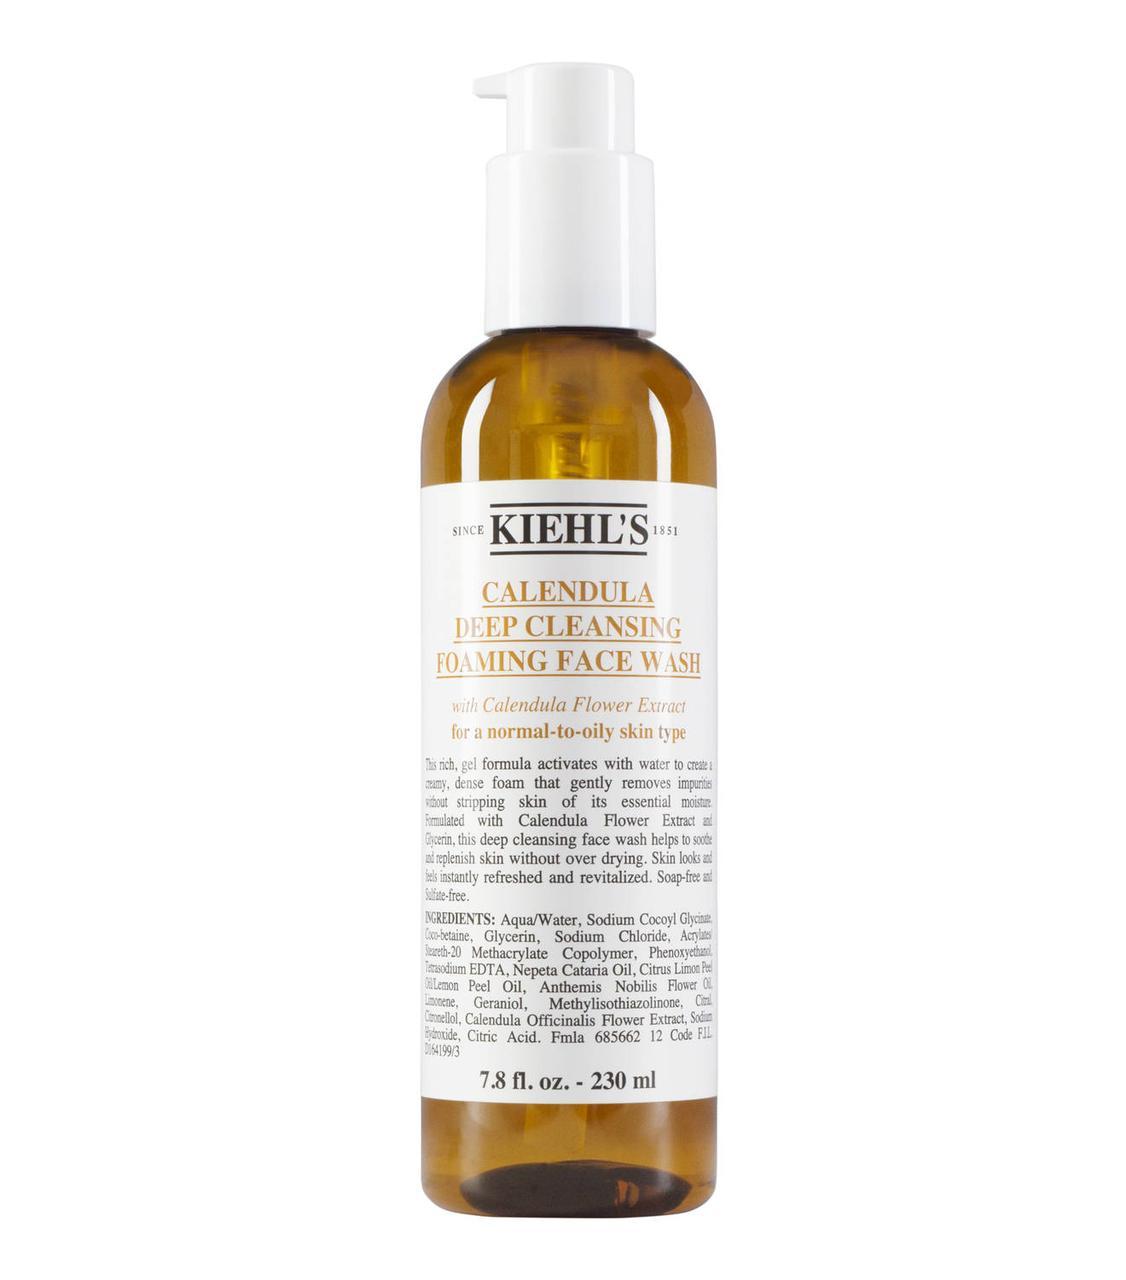 KIEHLS Calendula Deep Cleansing Foaming Face Wash 230ml